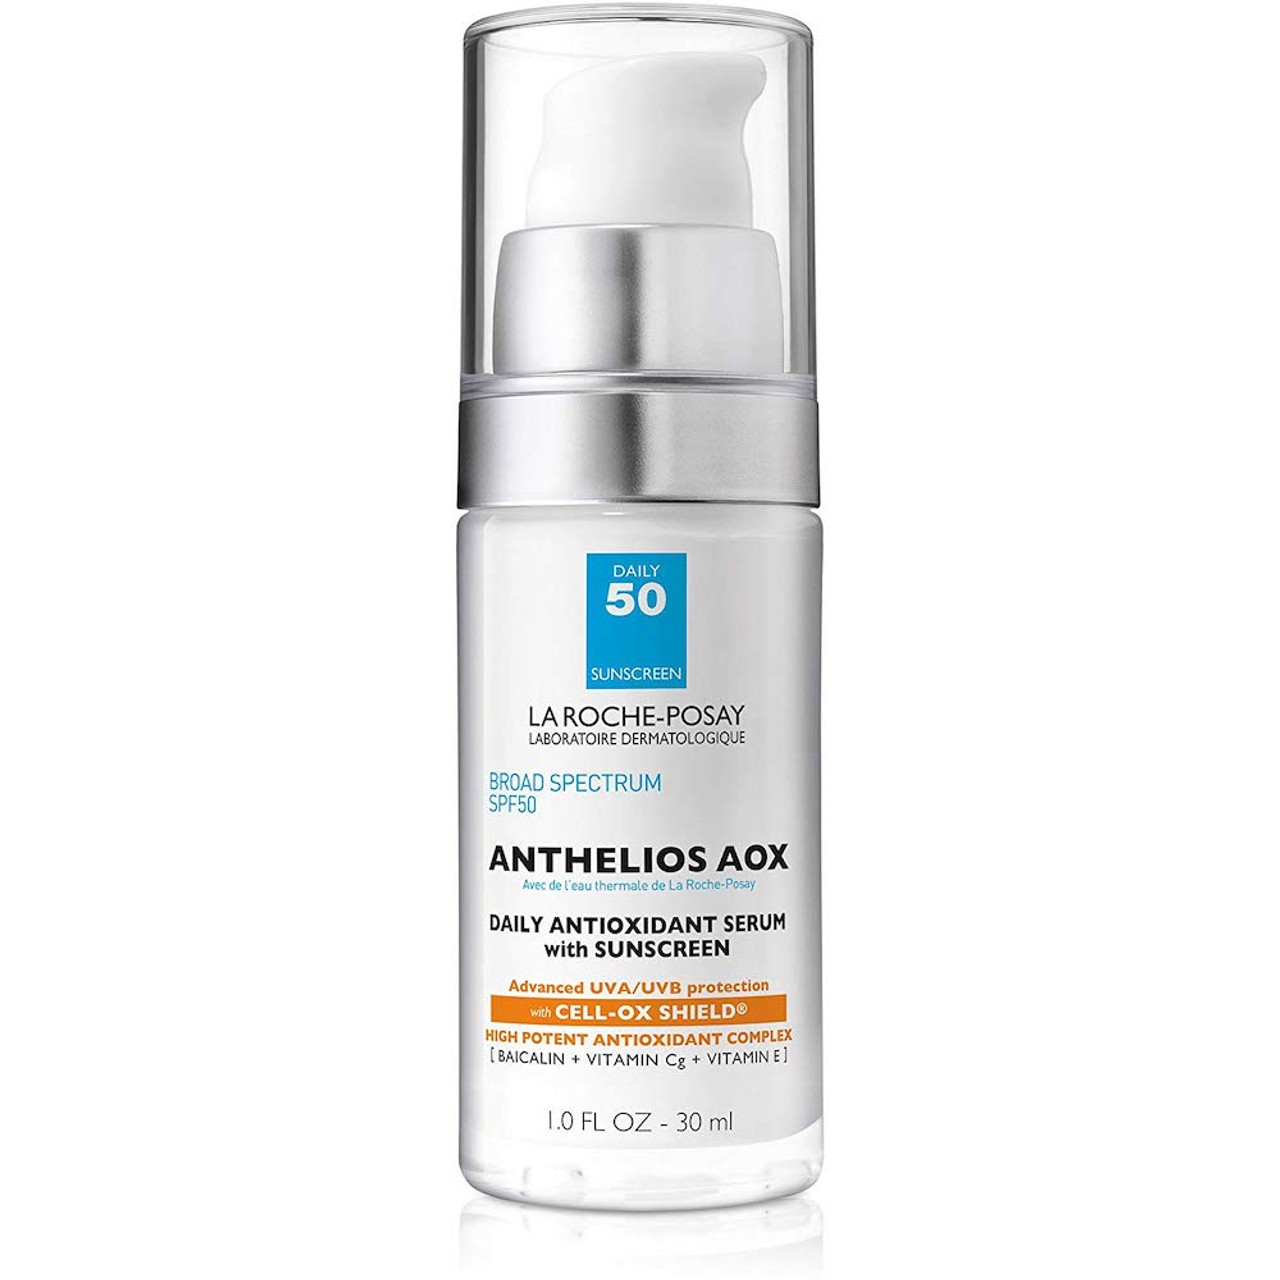 La Roche Posay Anthelios AOX Antioxidant Serum SPF 50 BeautifiedYou.com